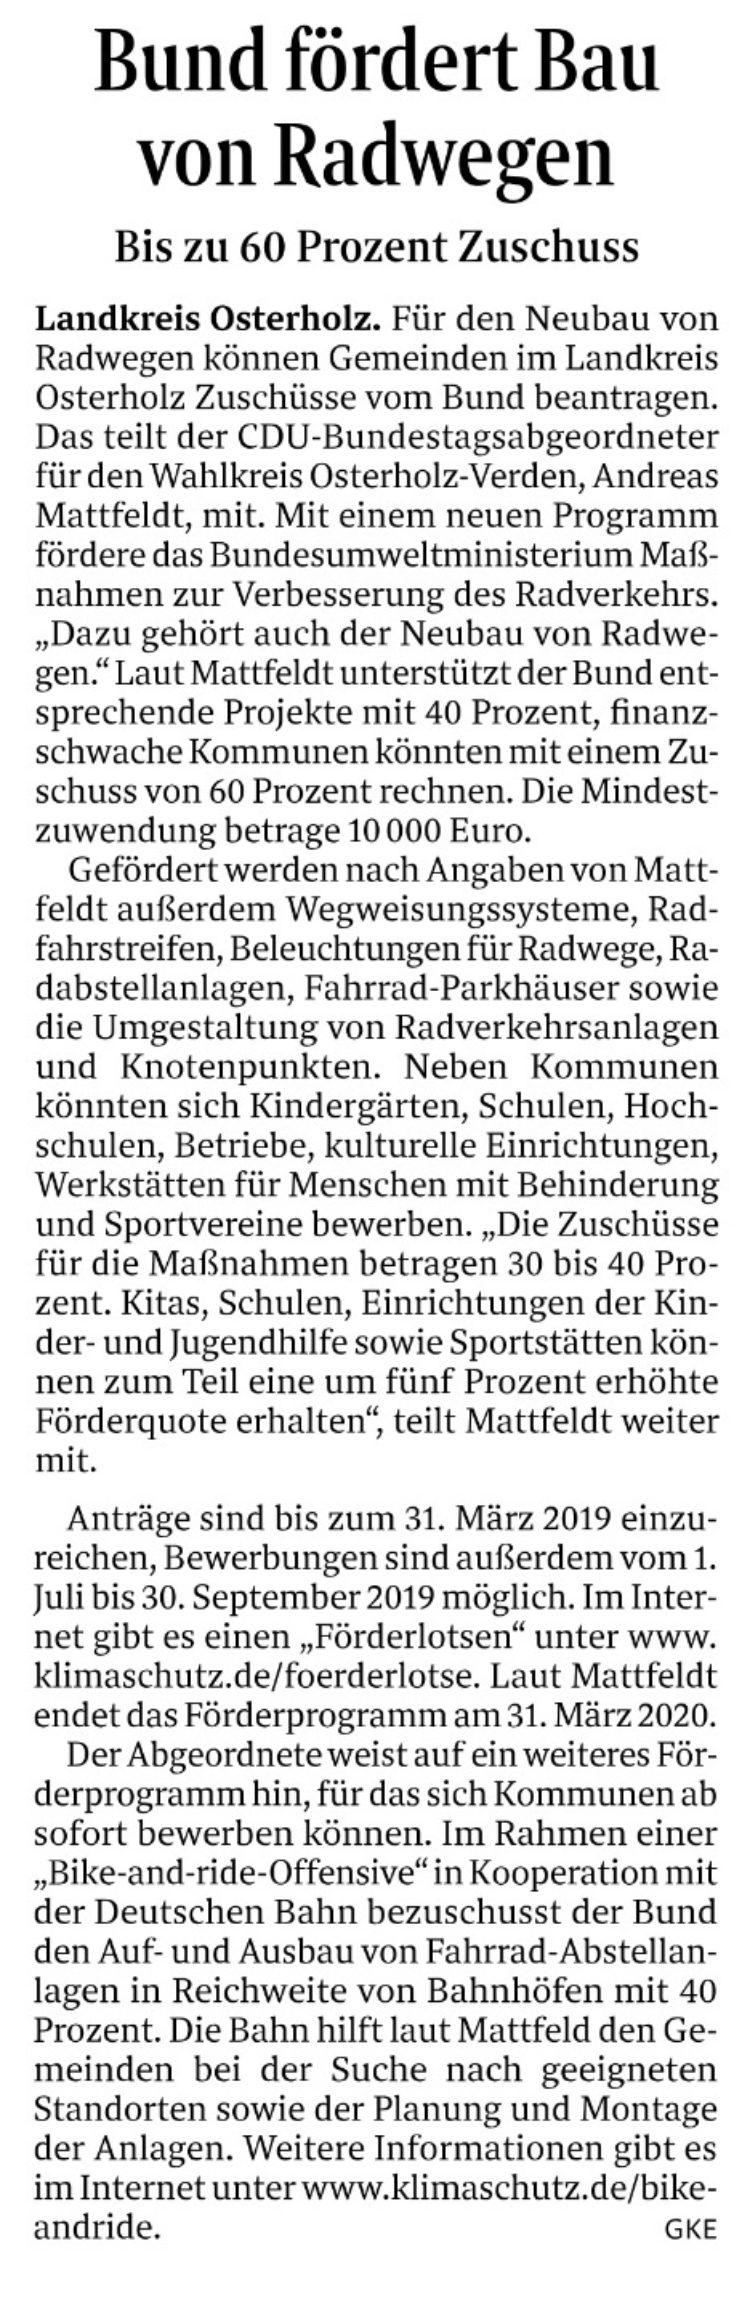 Bund fördert Radwegebau